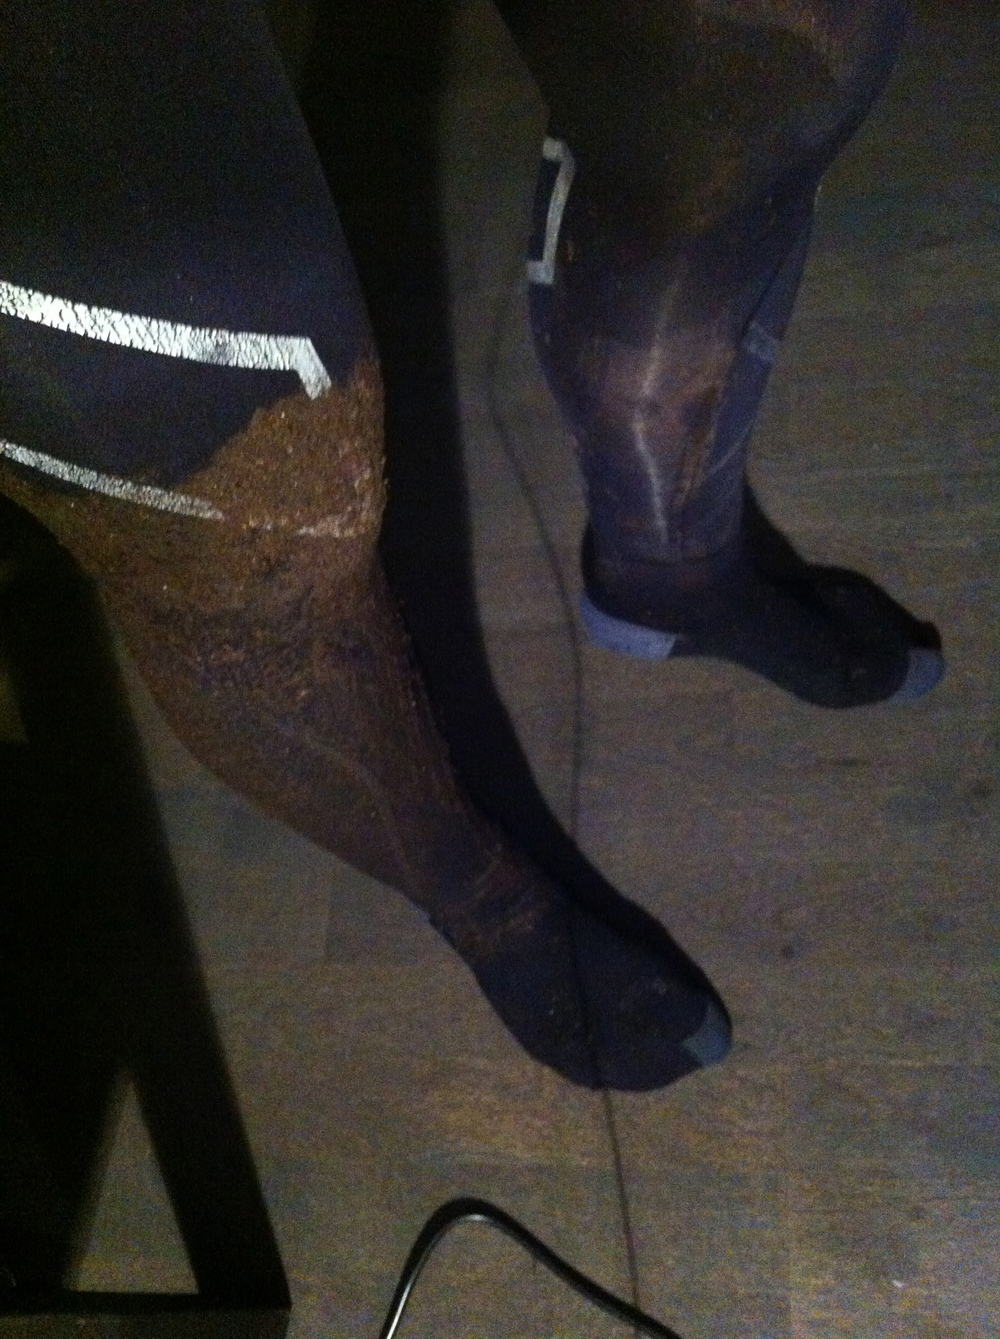 Gjørmete 2XU tights. Lav babefaktor eller hva Hege?